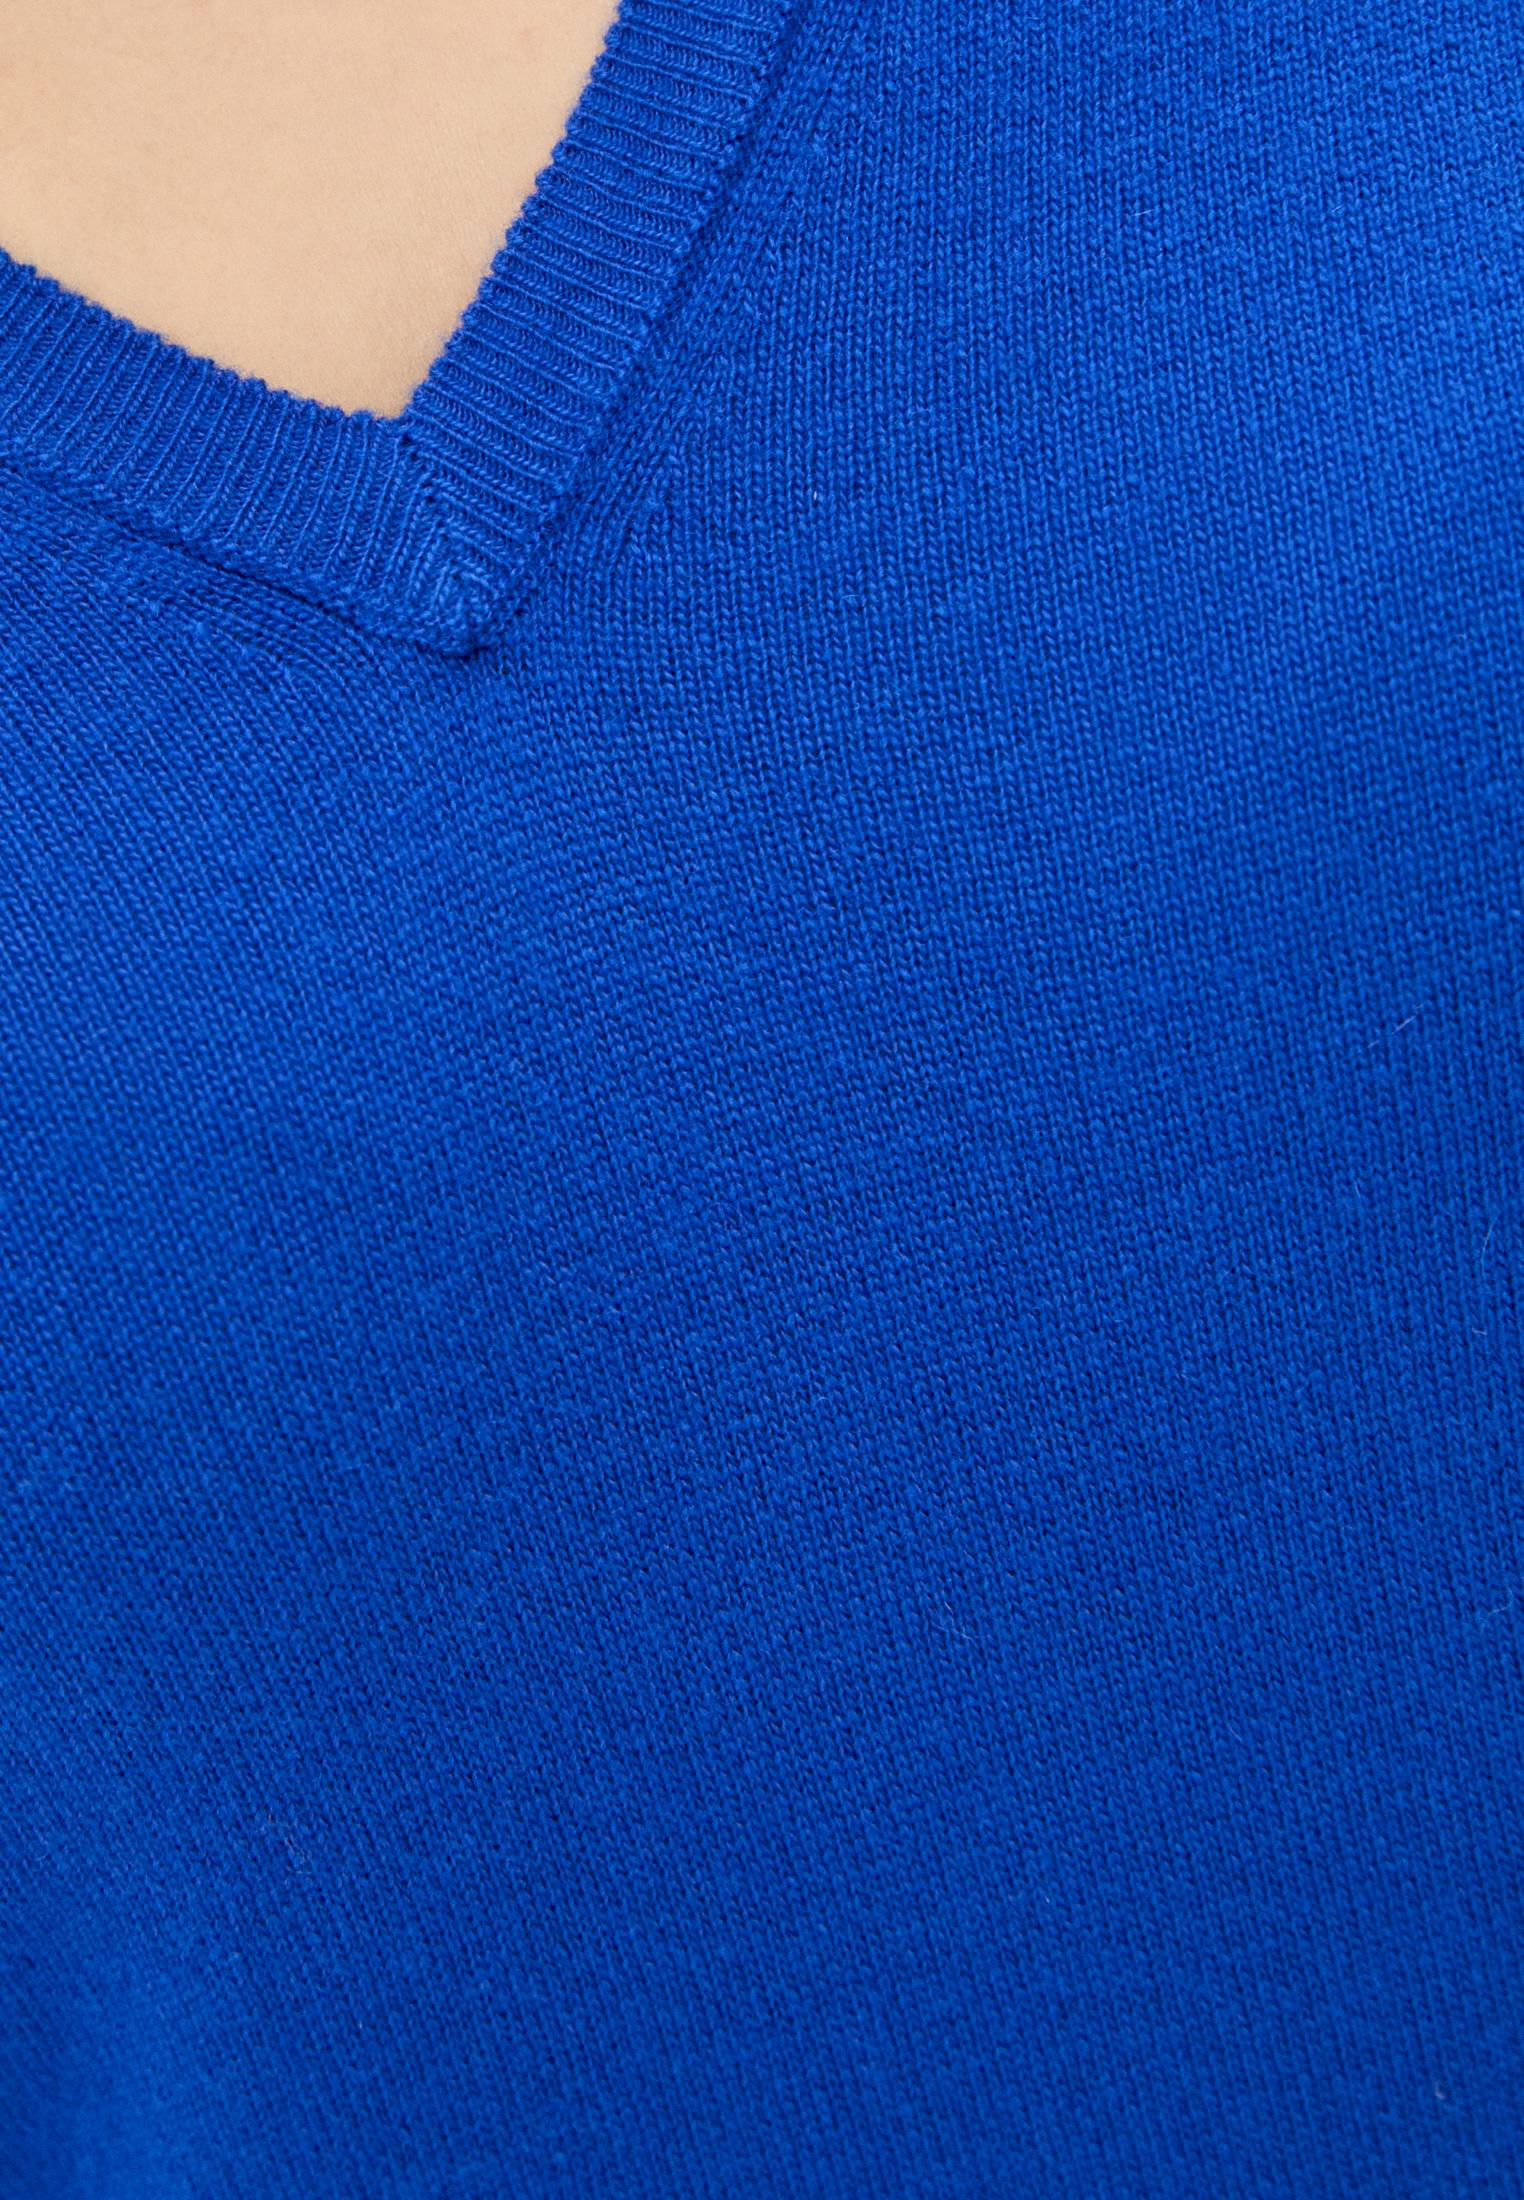 Пуловер United Colors of Benetton (Юнайтед Колорс оф Бенеттон) 1002D4488: изображение 7